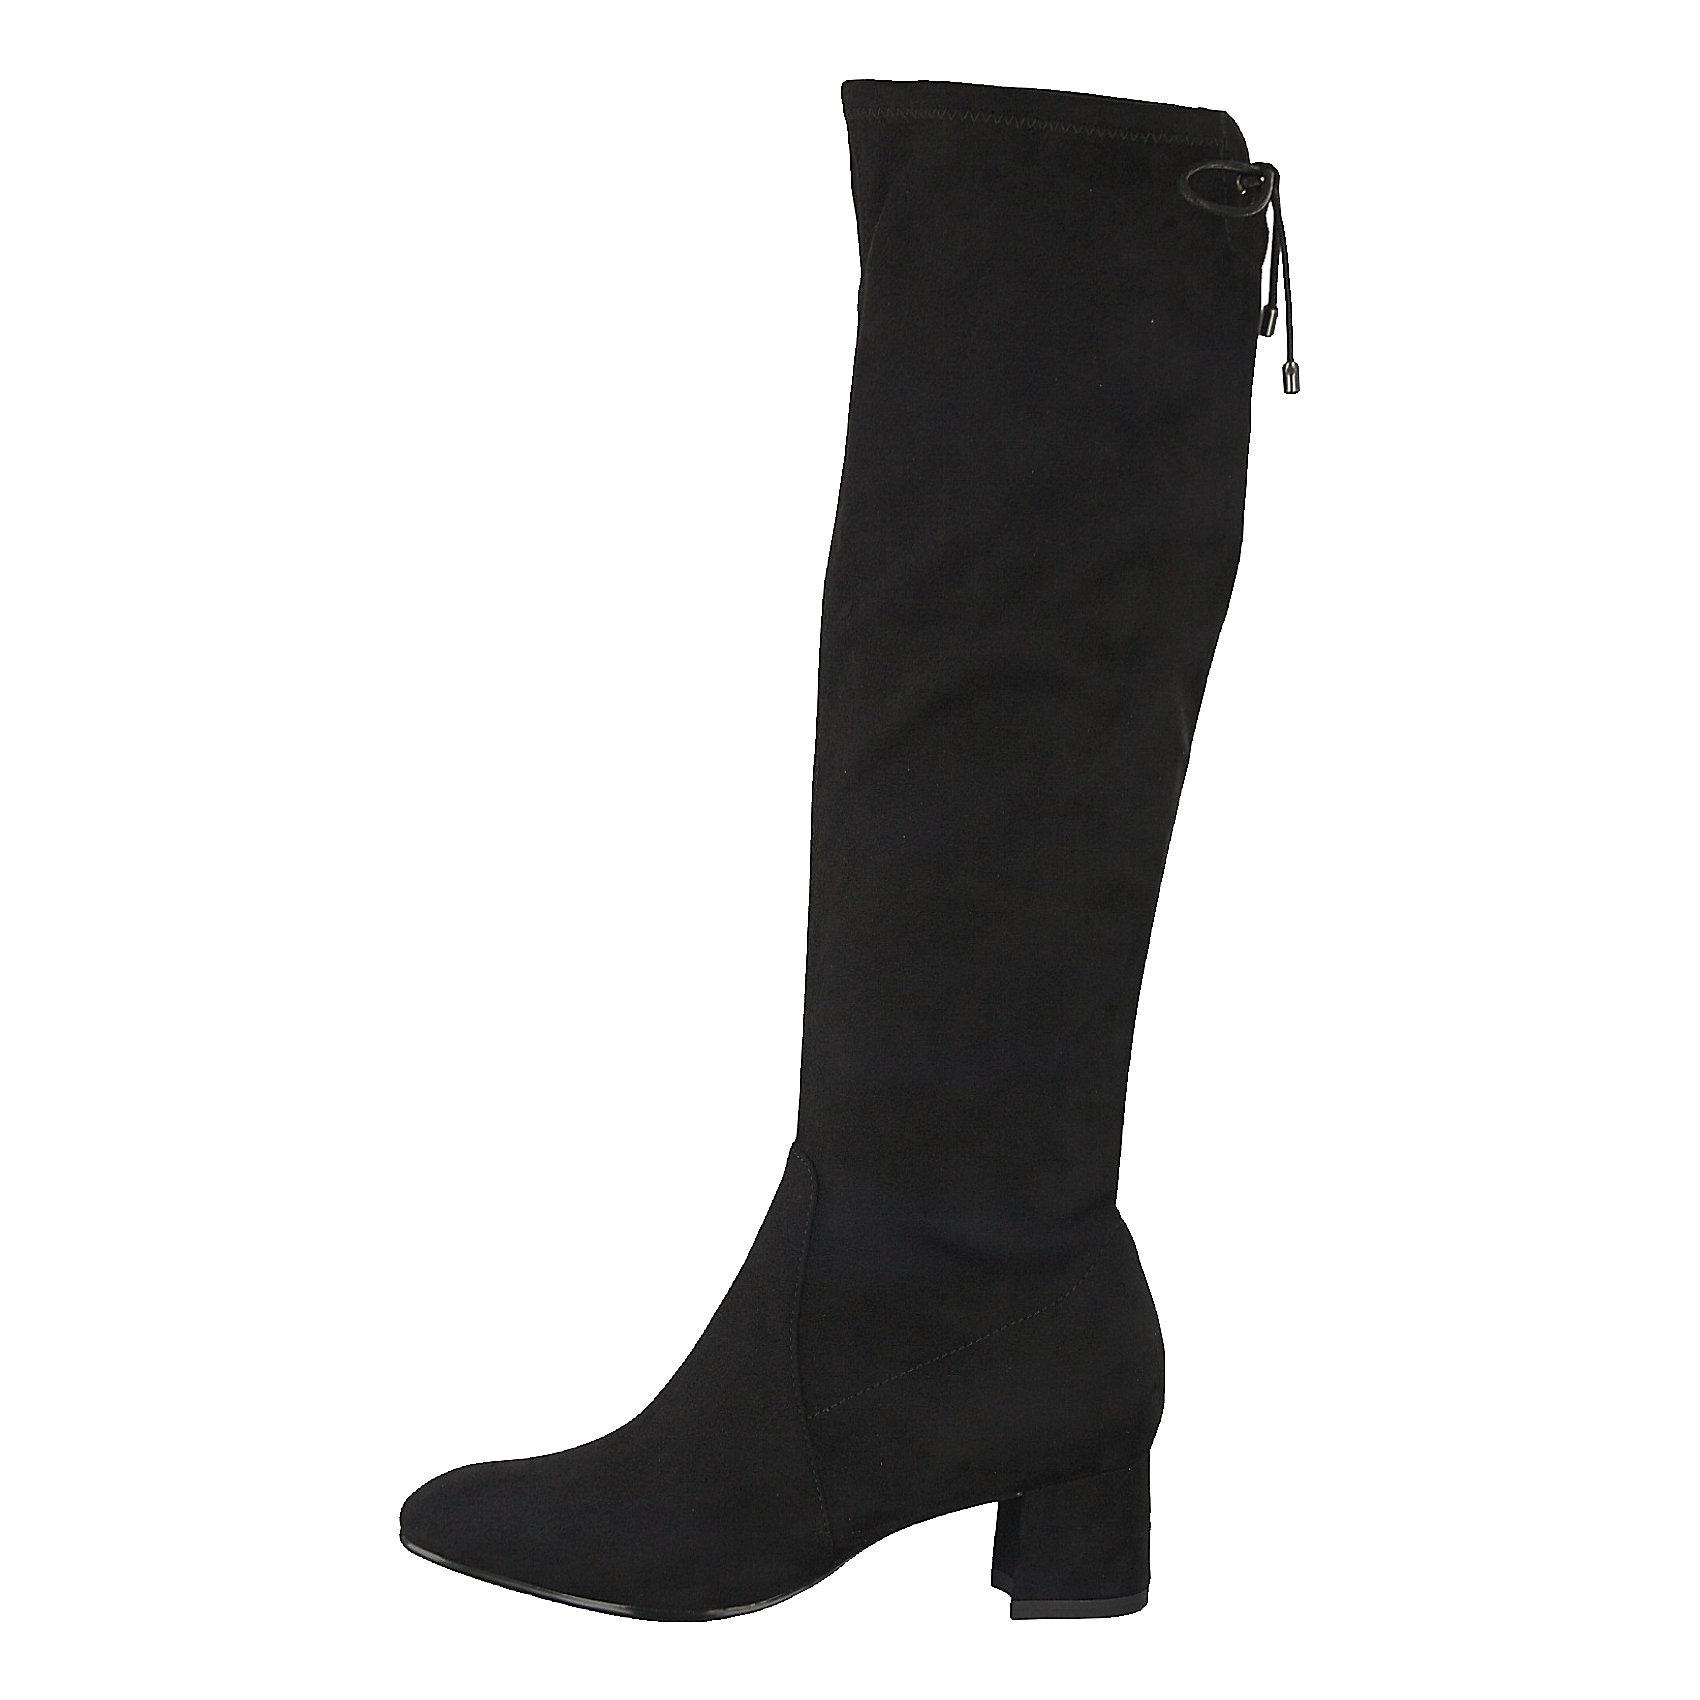 Neu Tamaris Stiefel schwarz grau 6881101